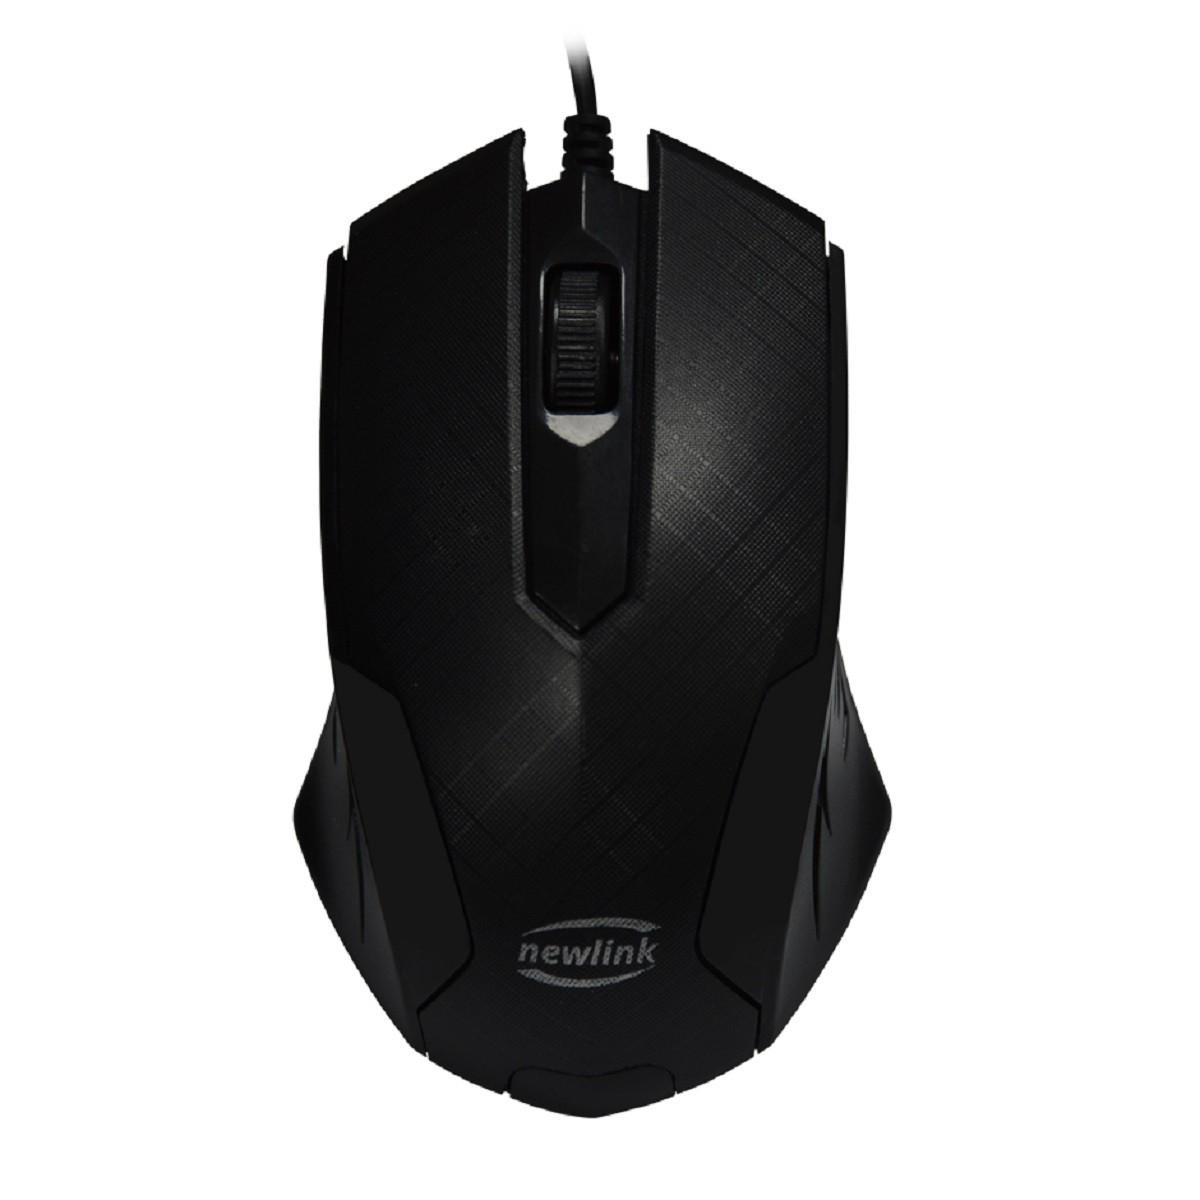 Mouse Com 1000 DPI MOUSE GRID NEW LINK MO228